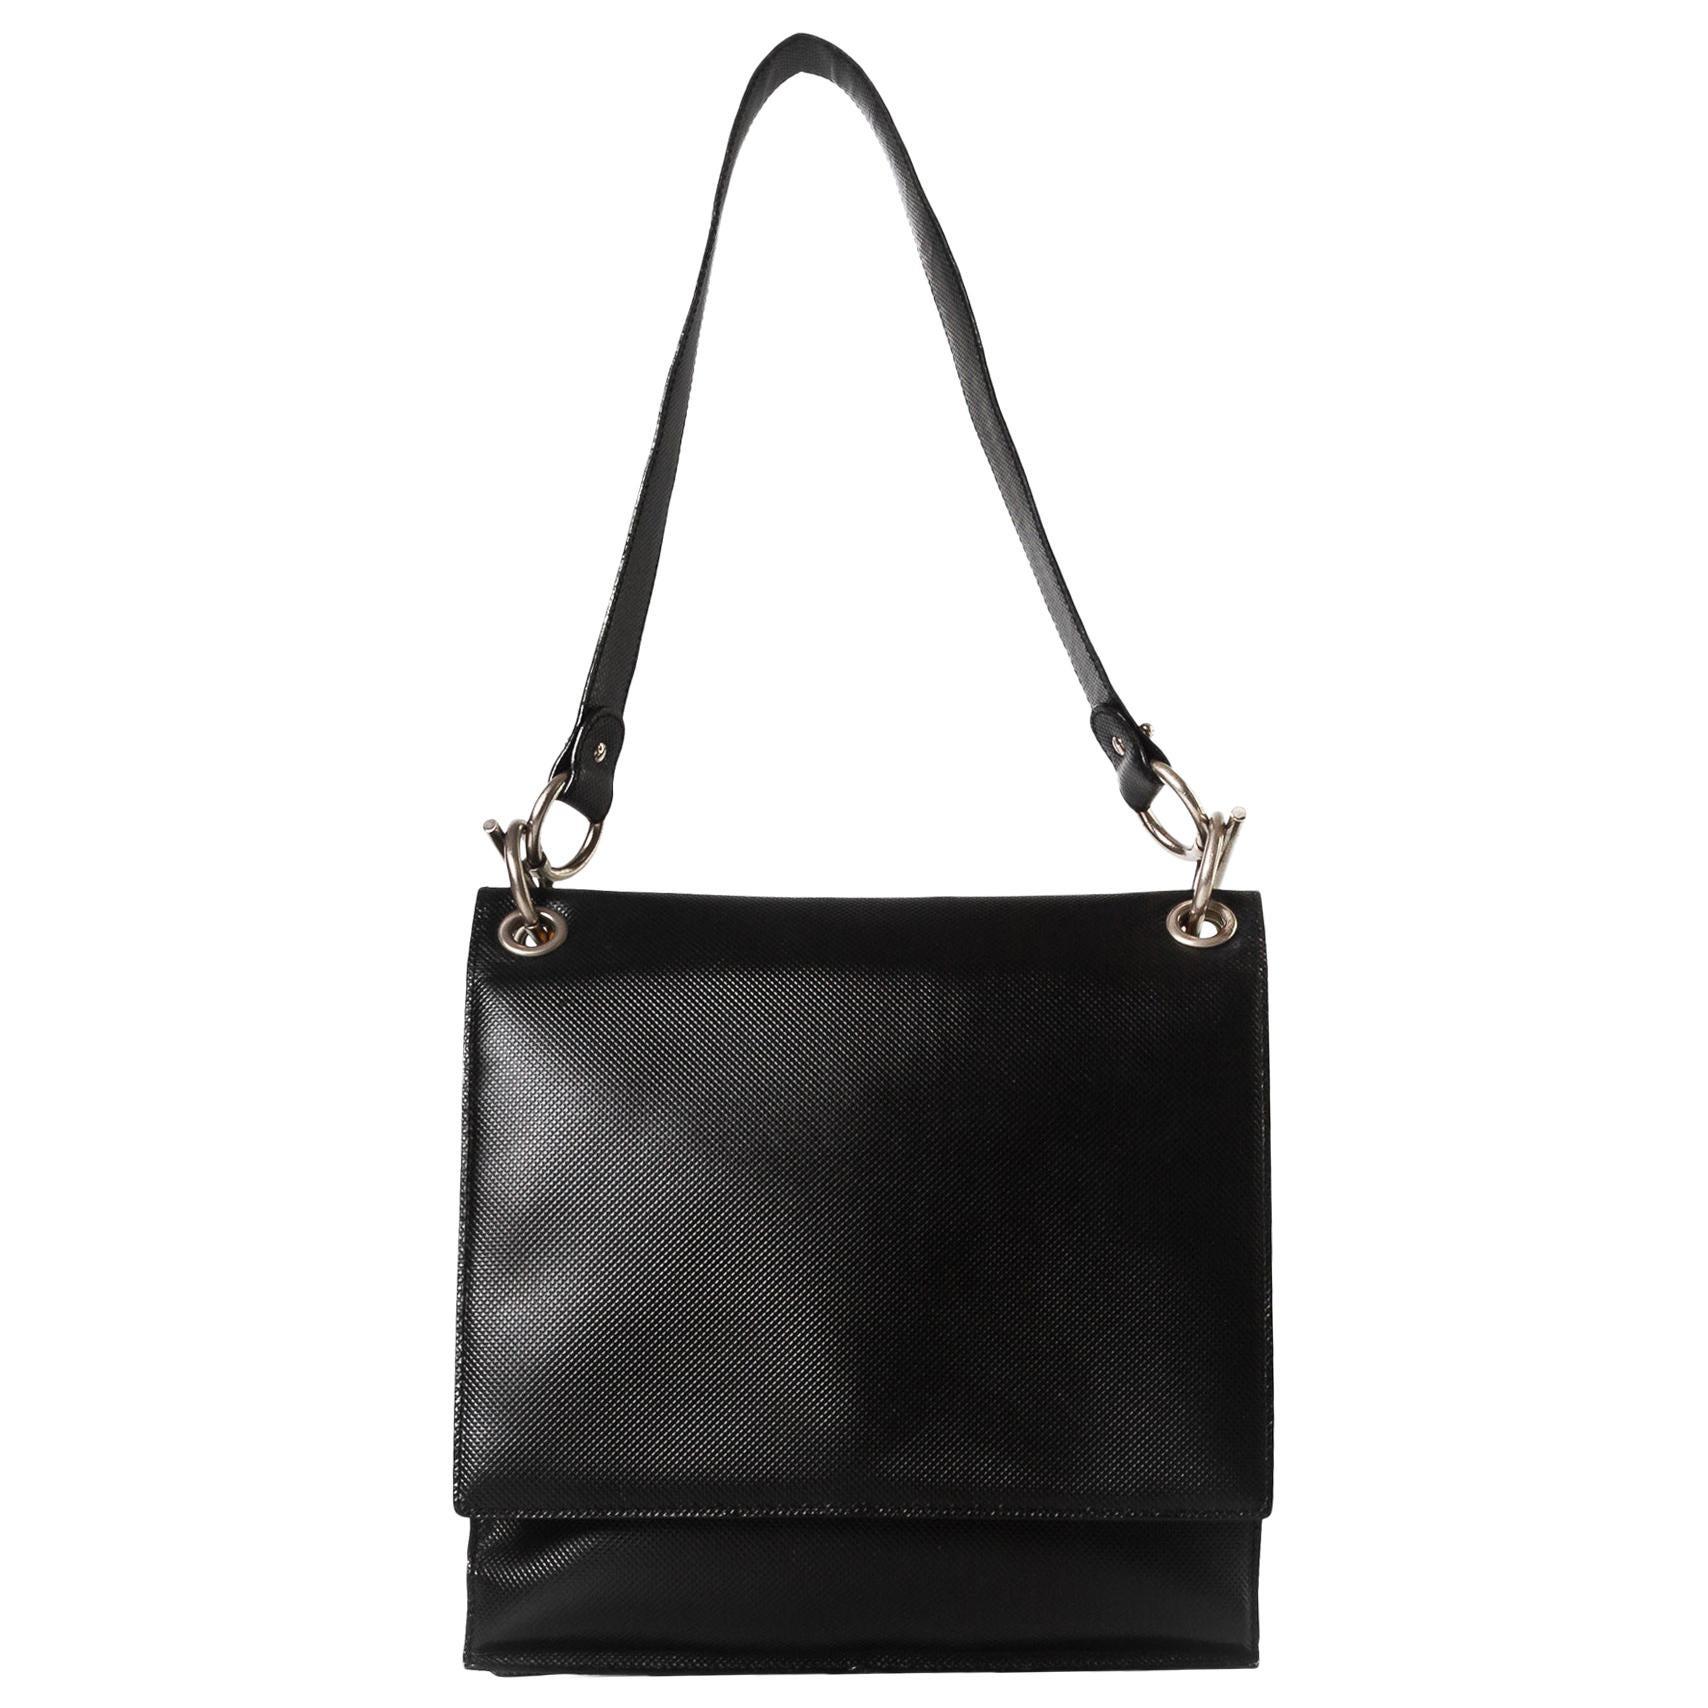 Bottega Veneta Vintage Black Safiano Leather Flap Bag